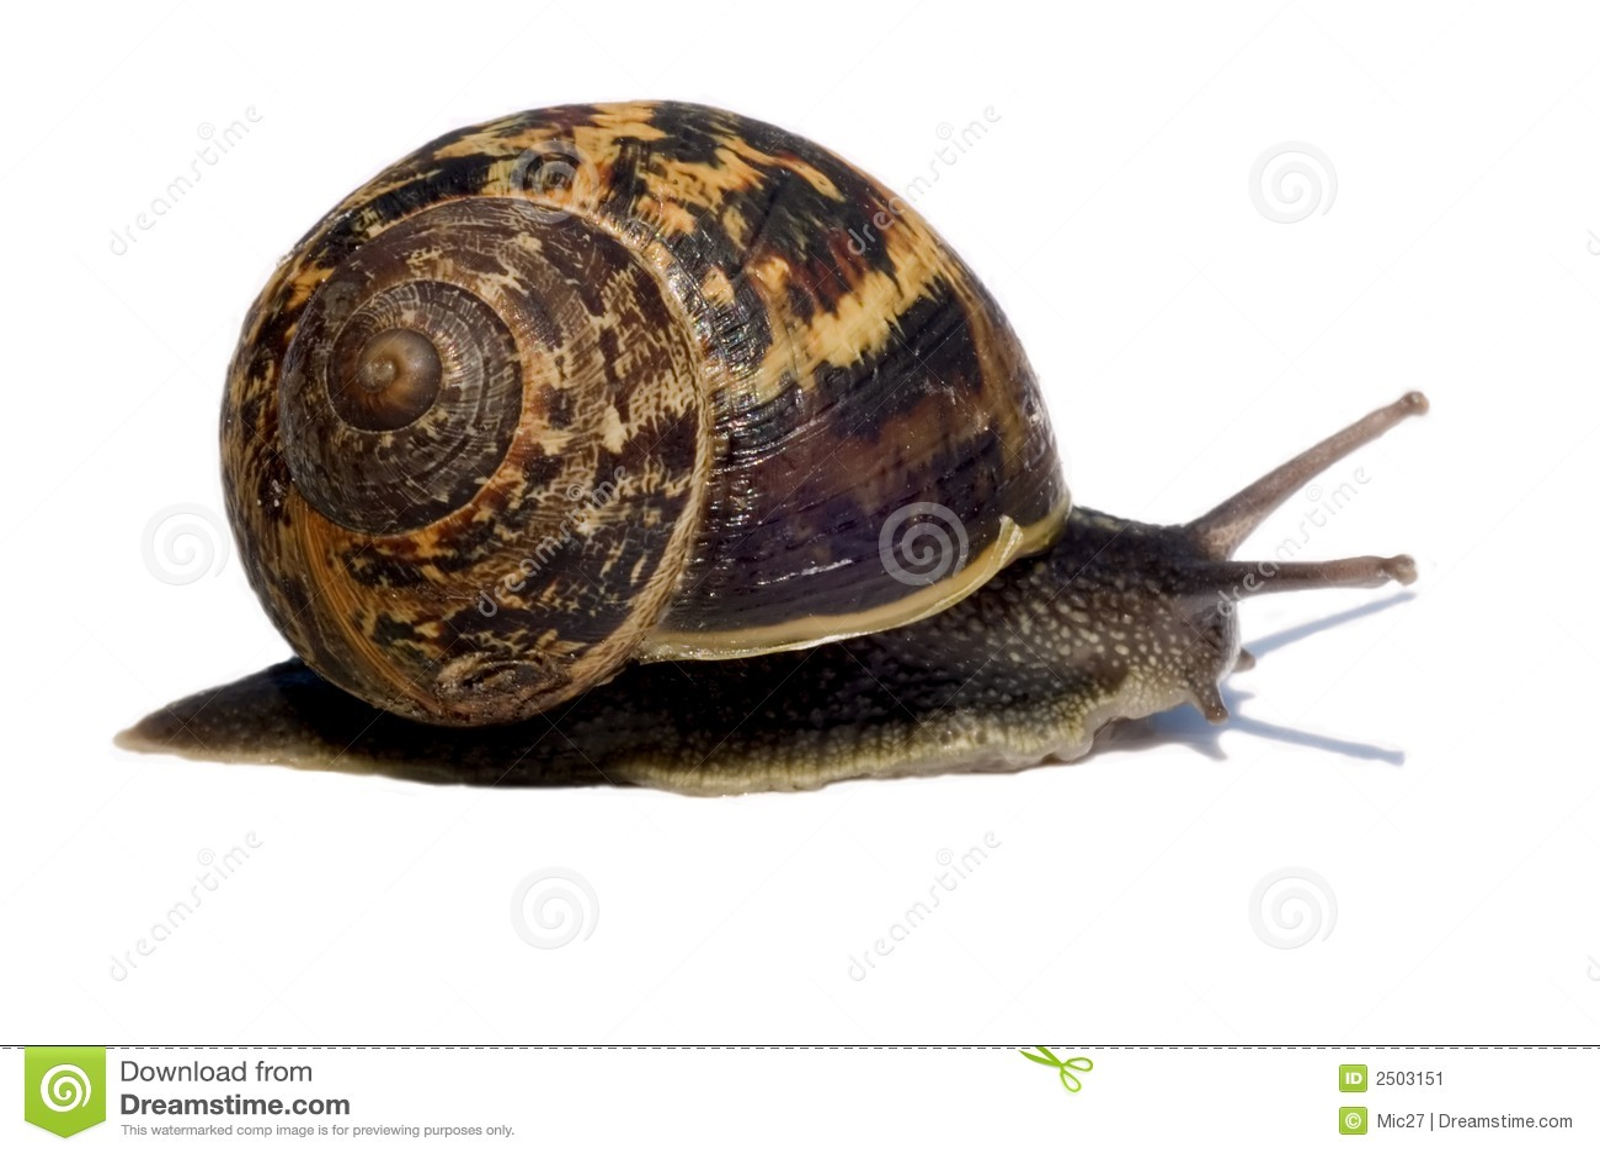 Beautiful Snail Stock Image. Image Of Detailed, Closeup